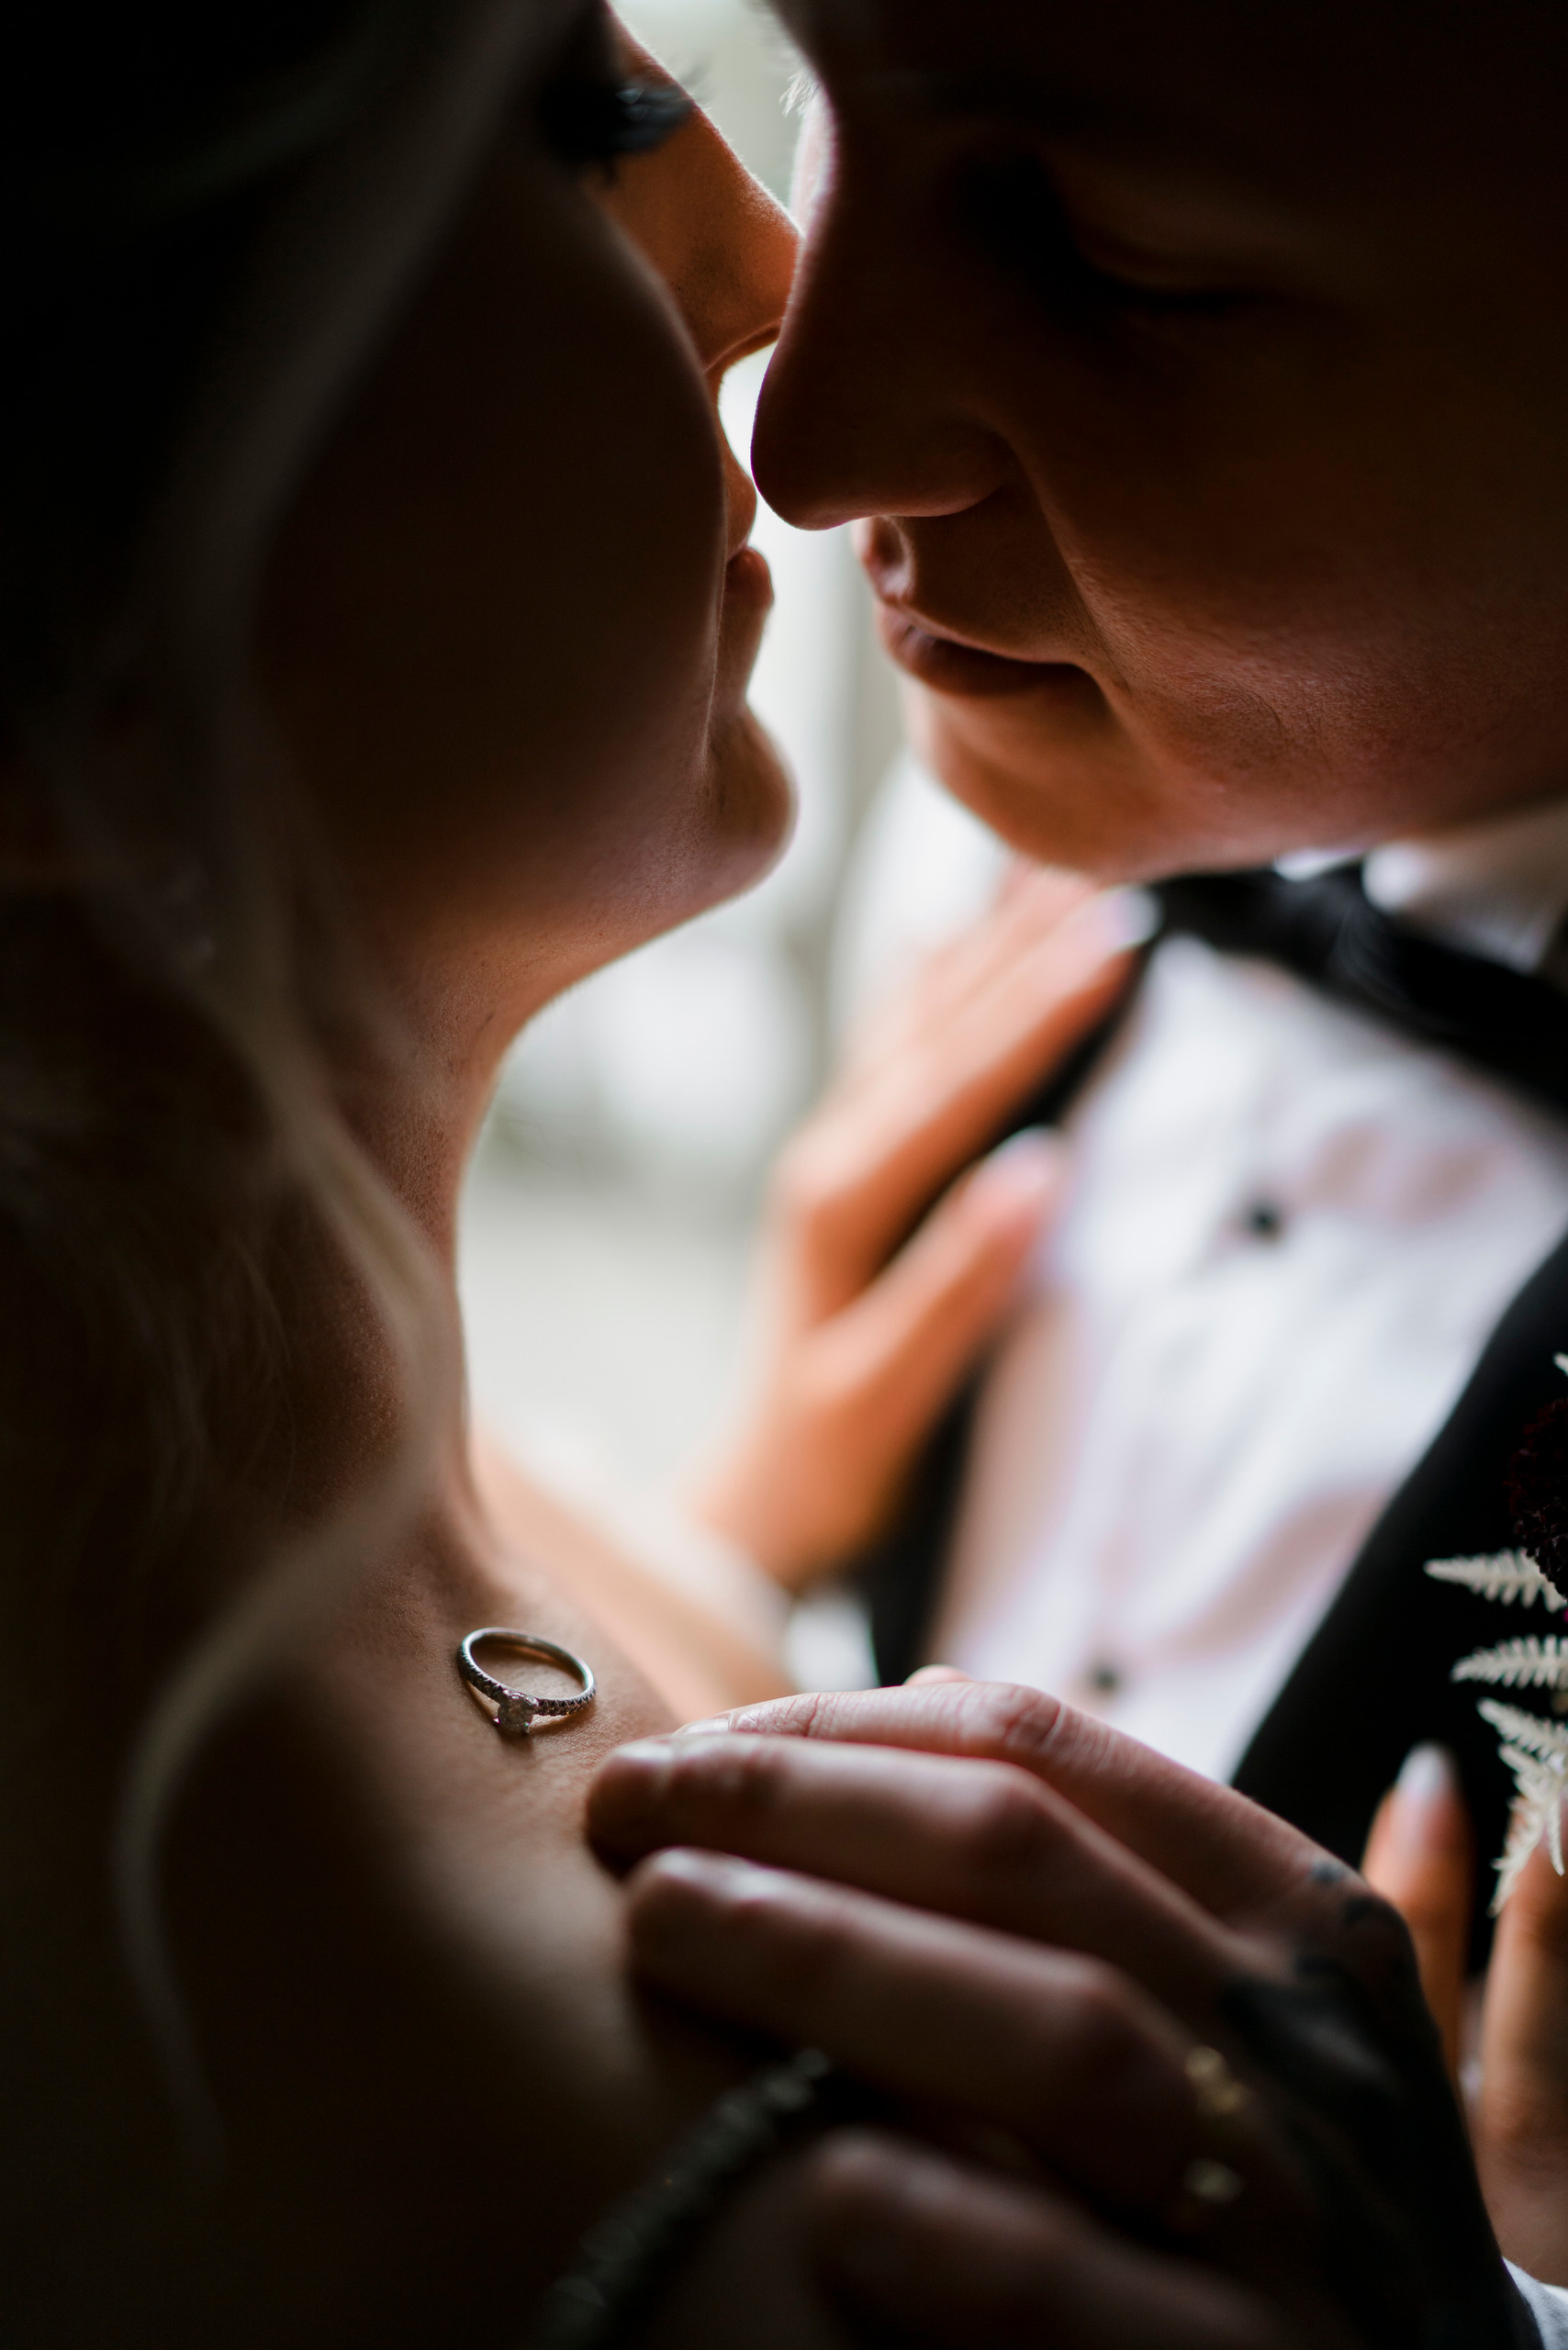 Unique wedding ring wedding photo| Full of love